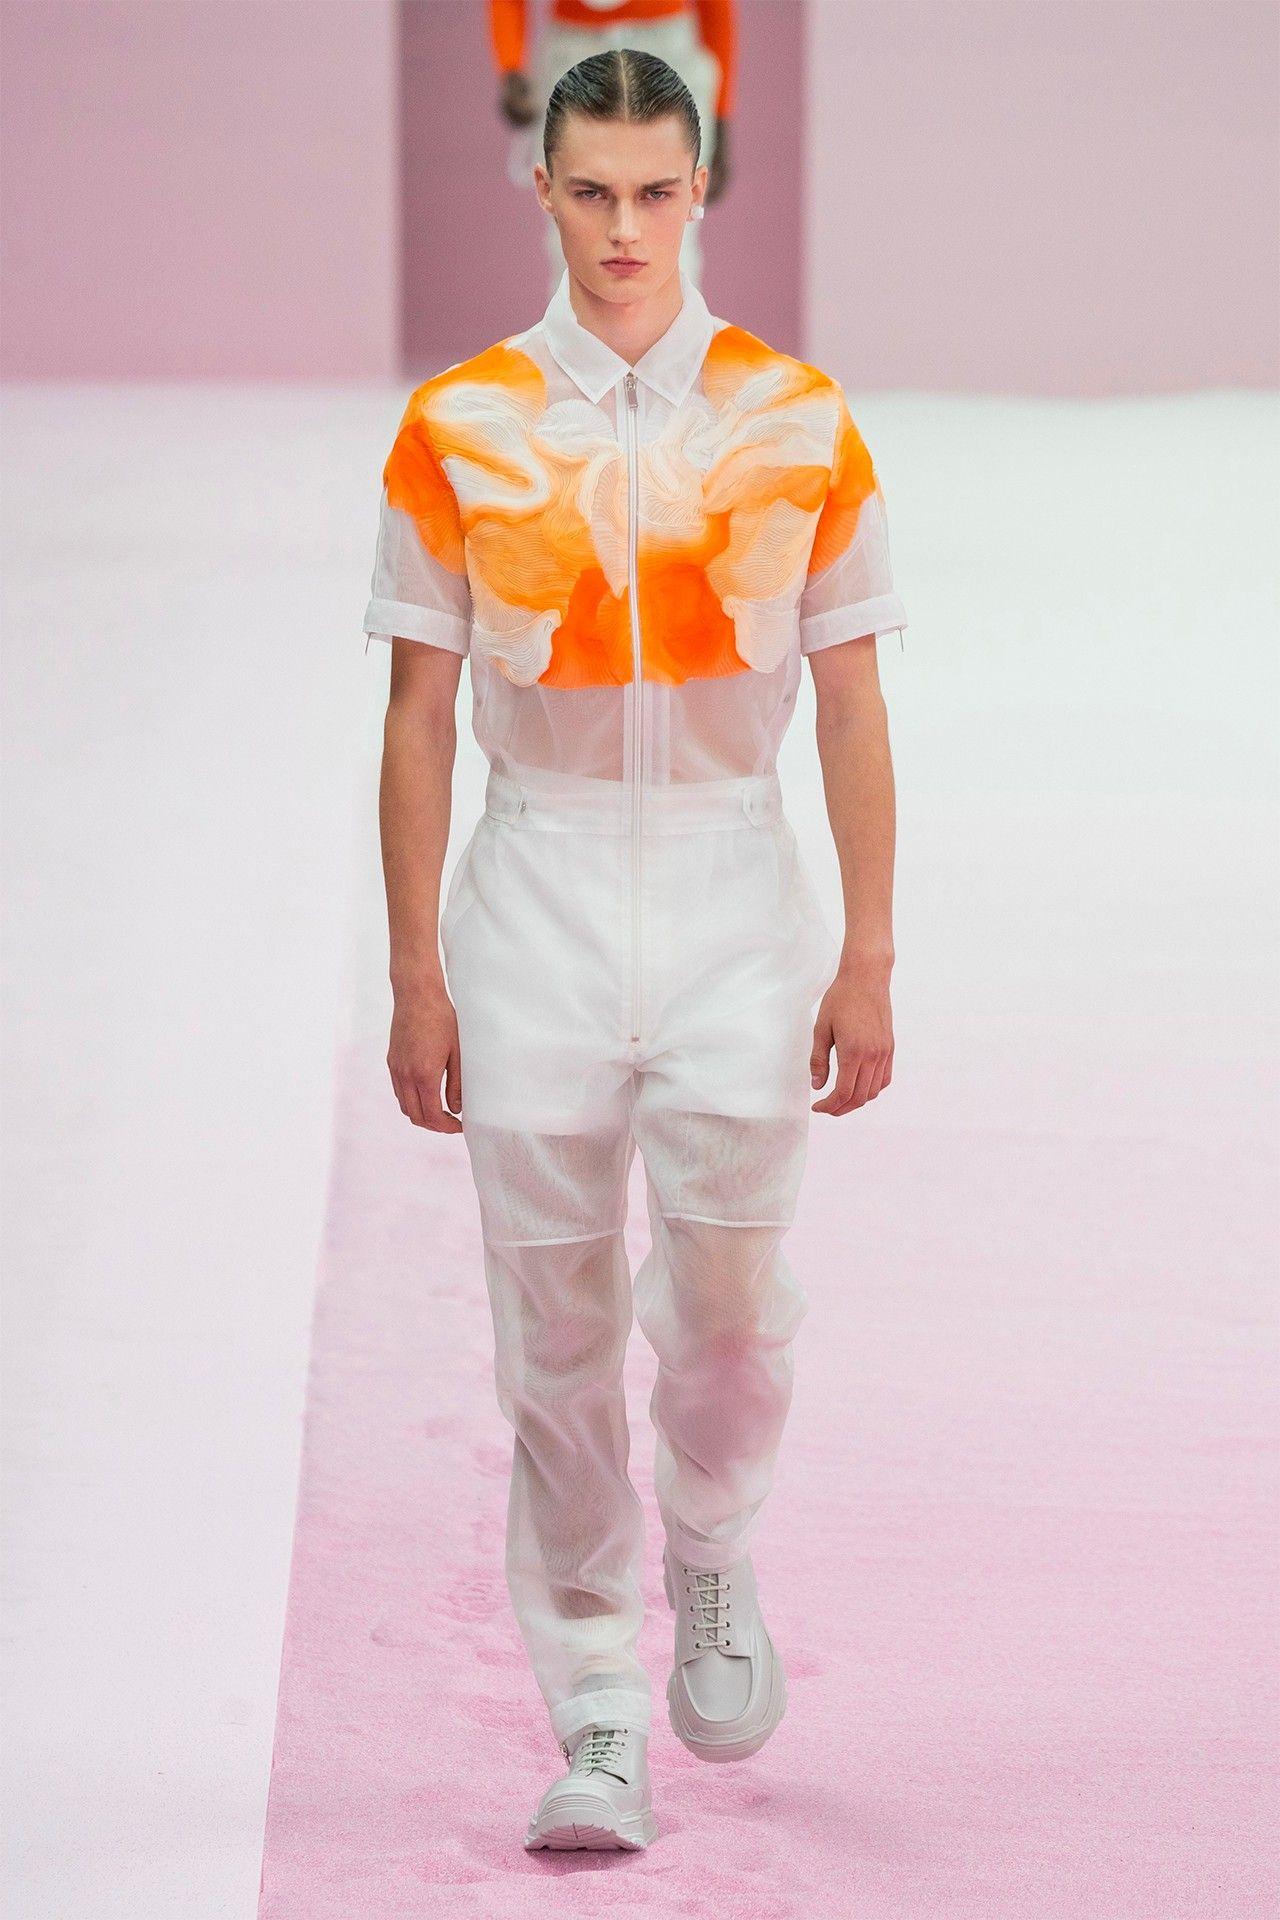 Dior menswear SS 2020